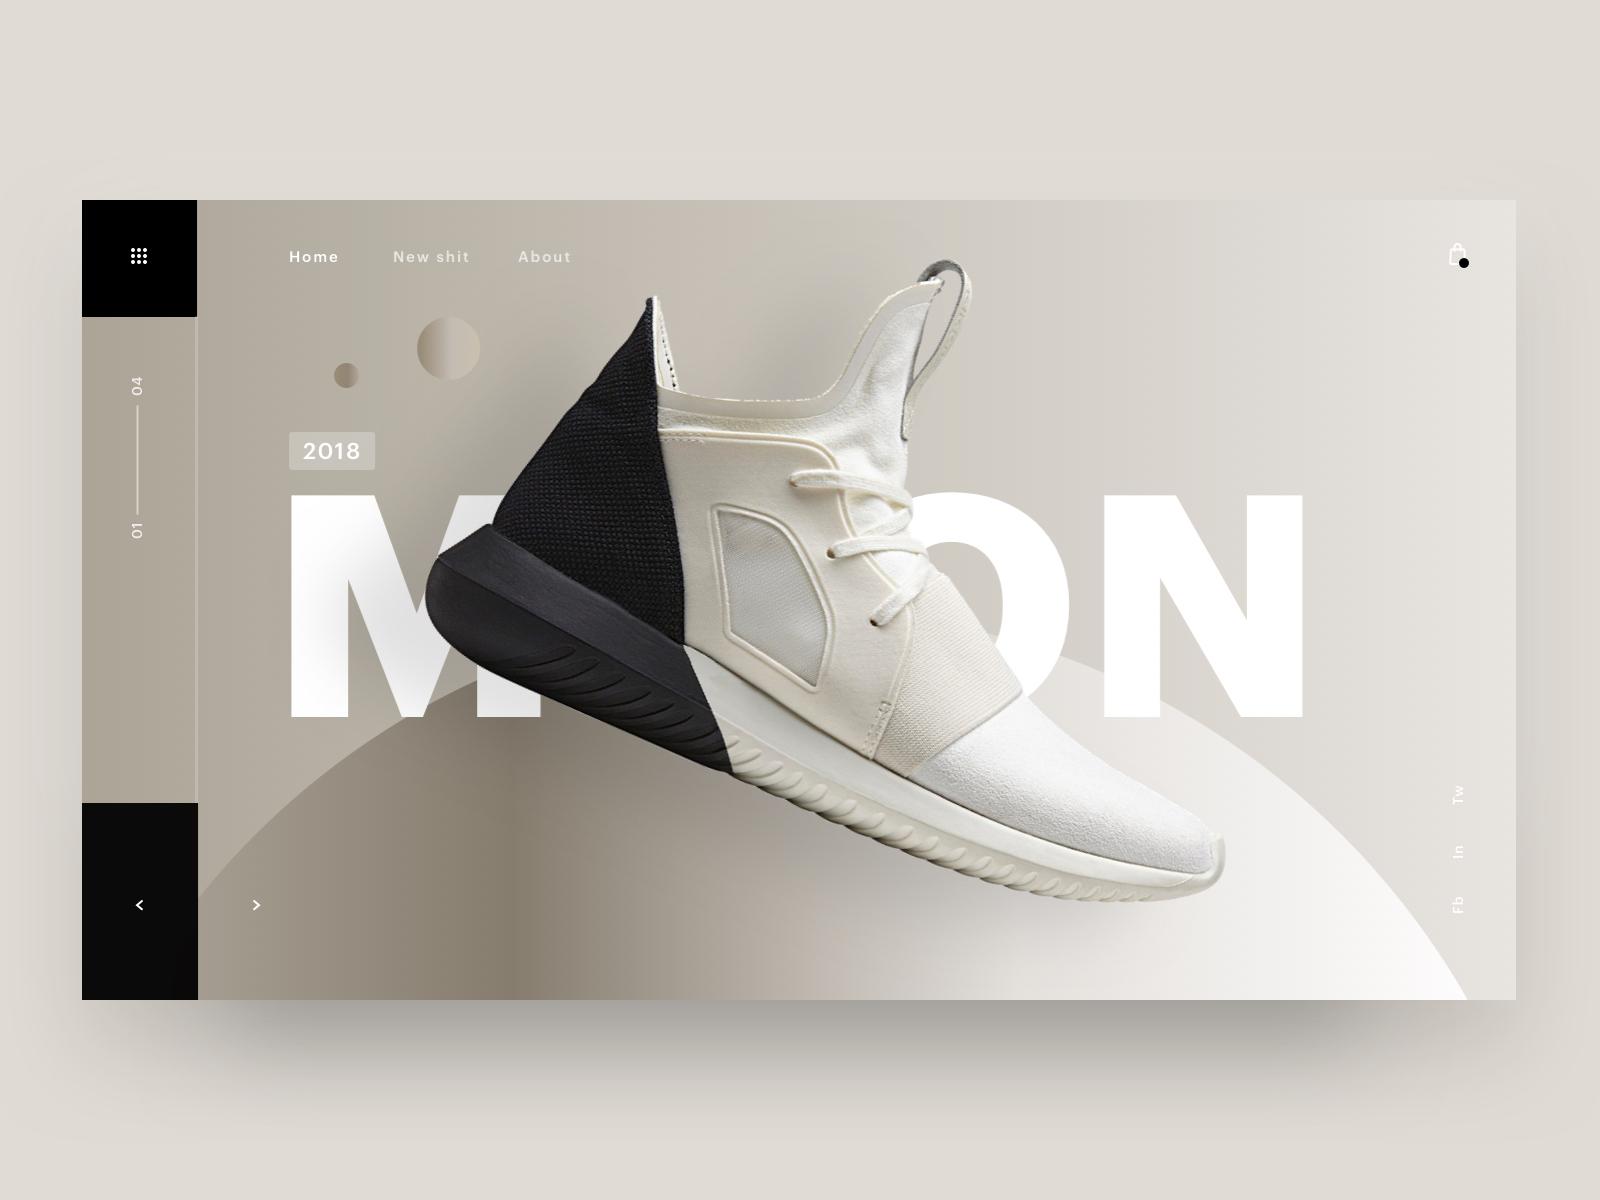 moon-shoes-mark-maynard_4x.jpg